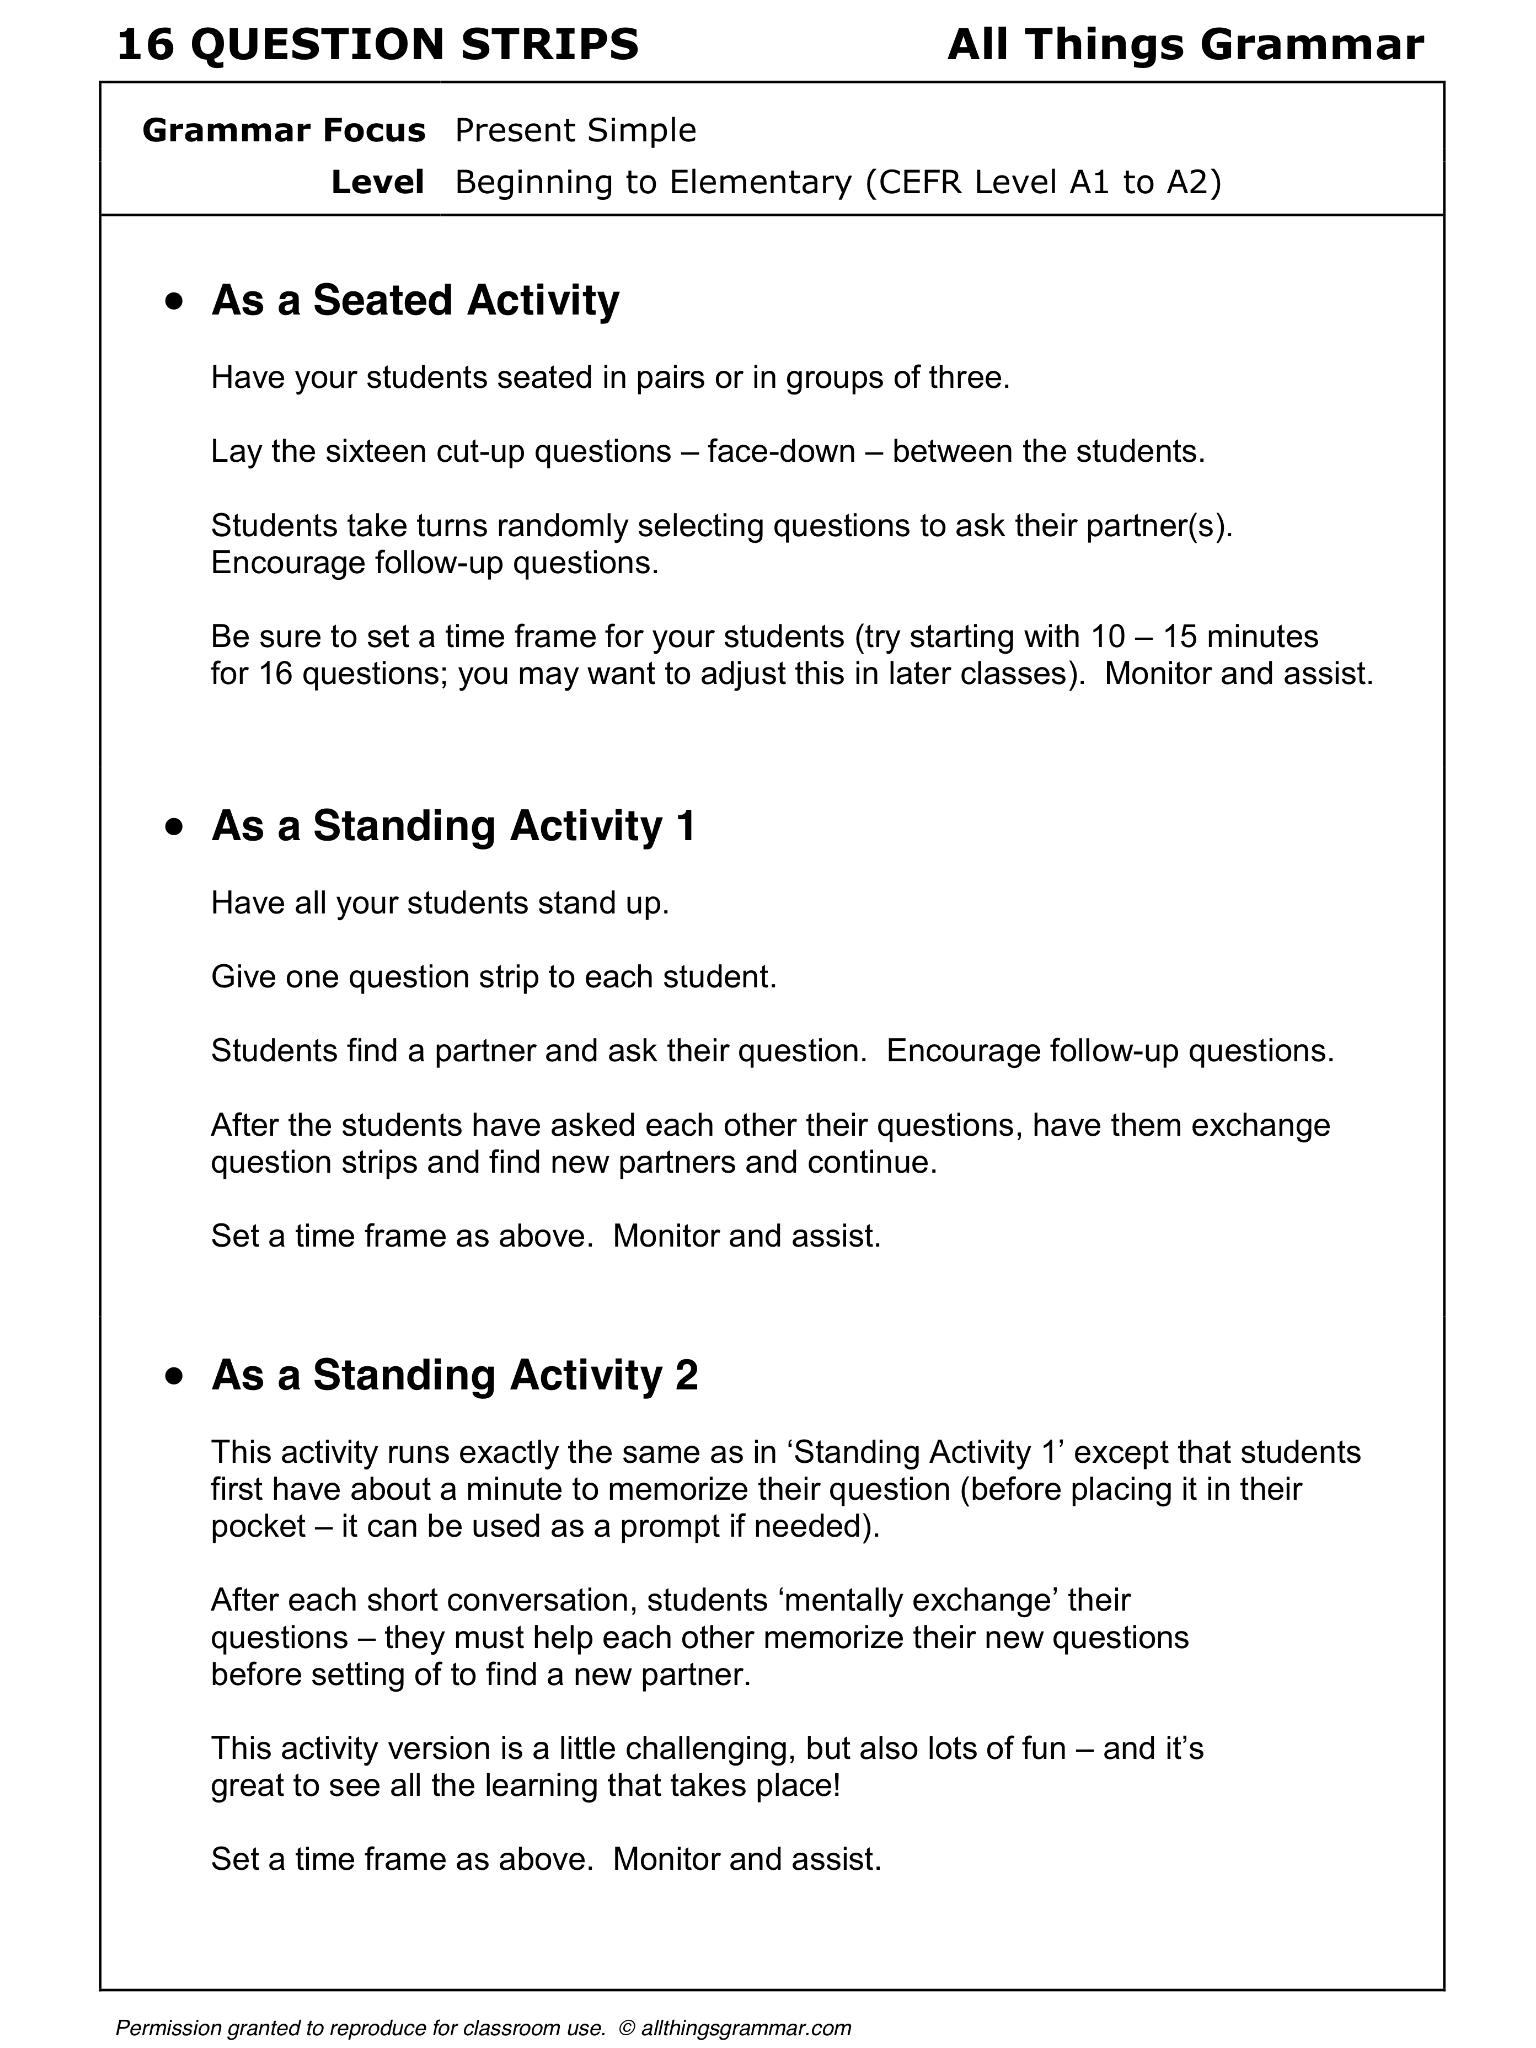 English Grammar Discussion Practice Present Simple 16